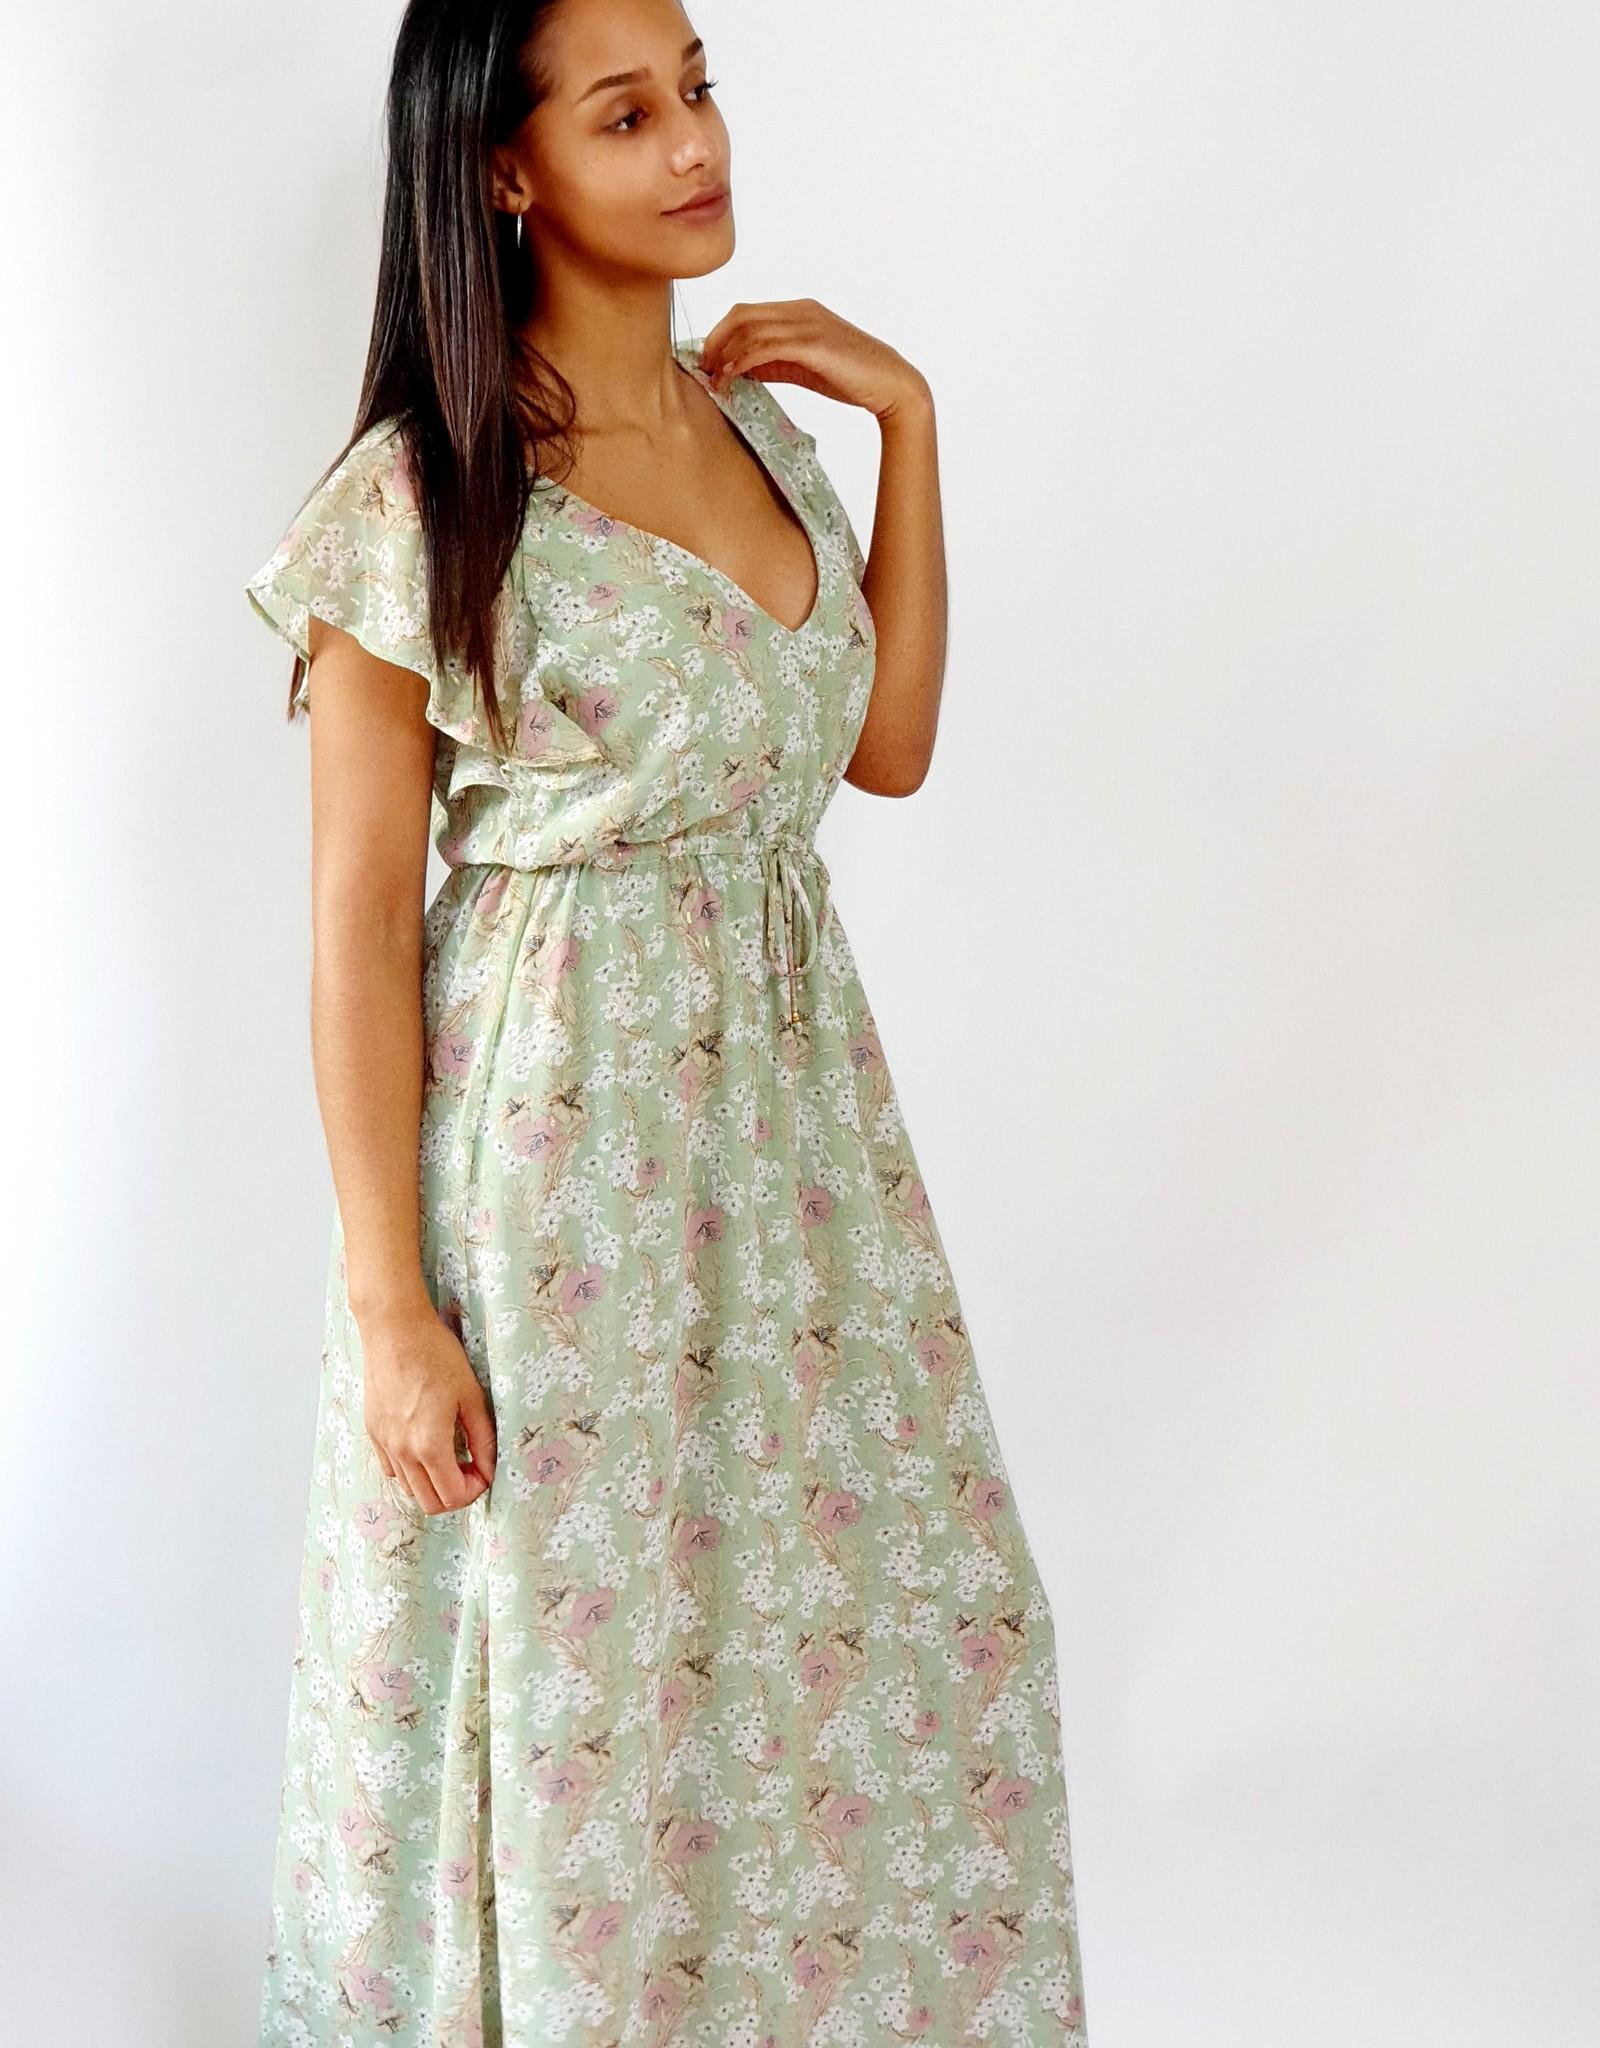 Thé dreamy dress